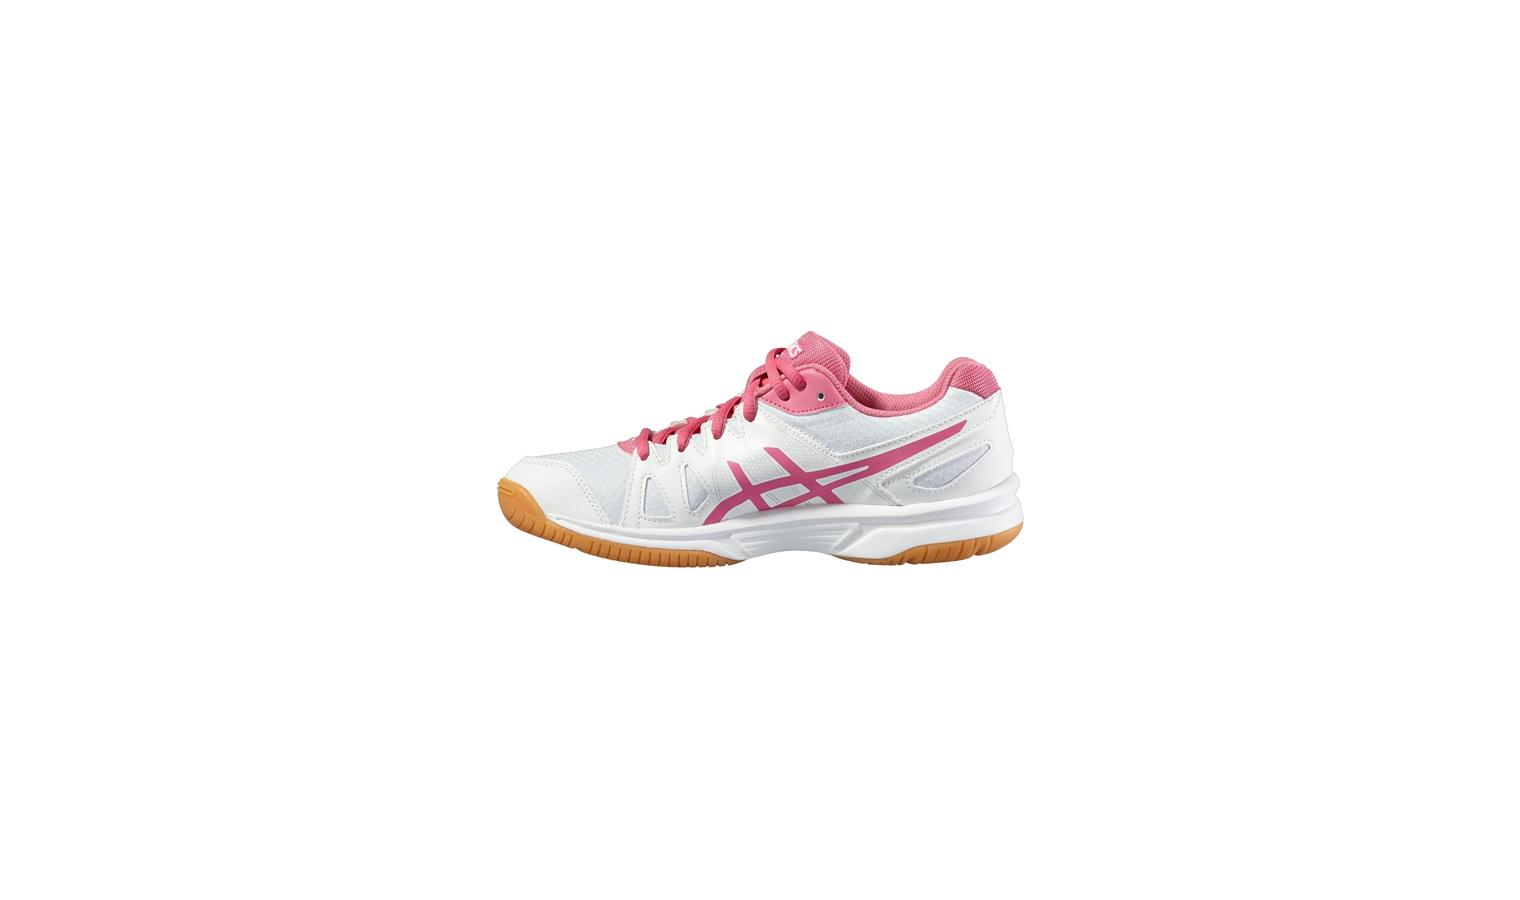 f9d5cc45df21a Dámske topánky na squash / badminton / florbal Asics GEL-UPCOURT W bielej